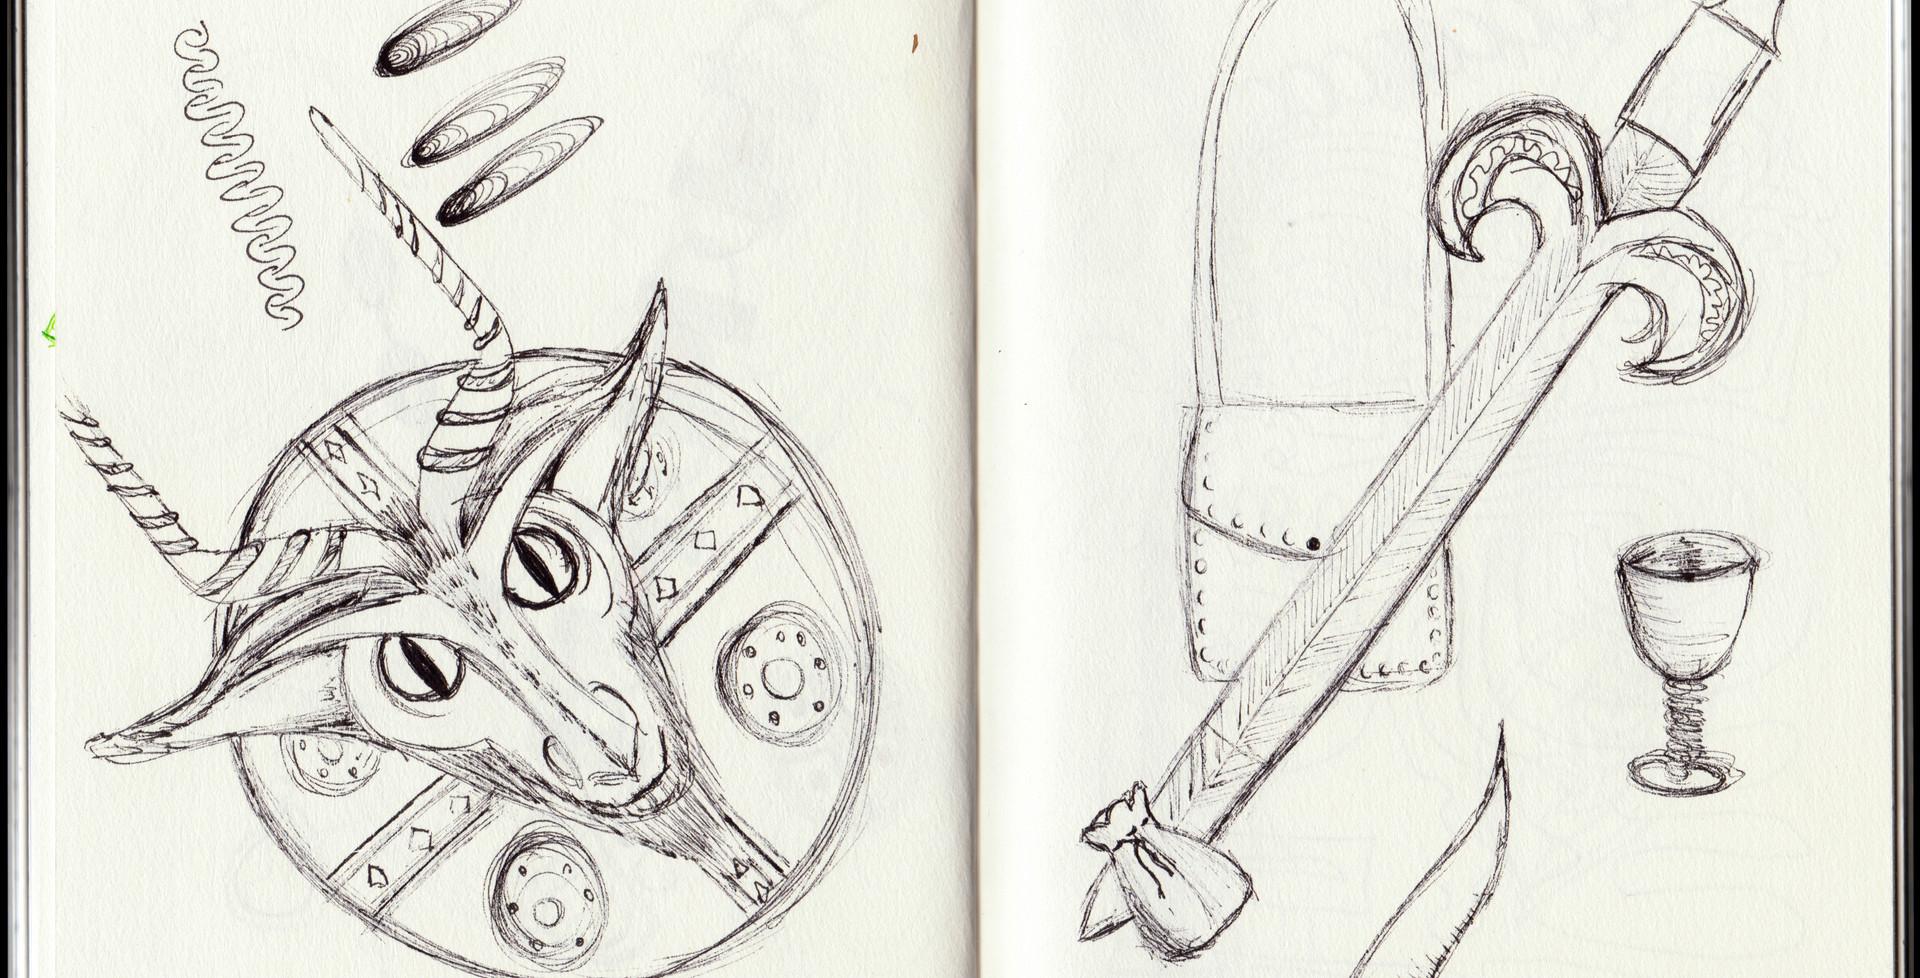 Sketchbook Page 3